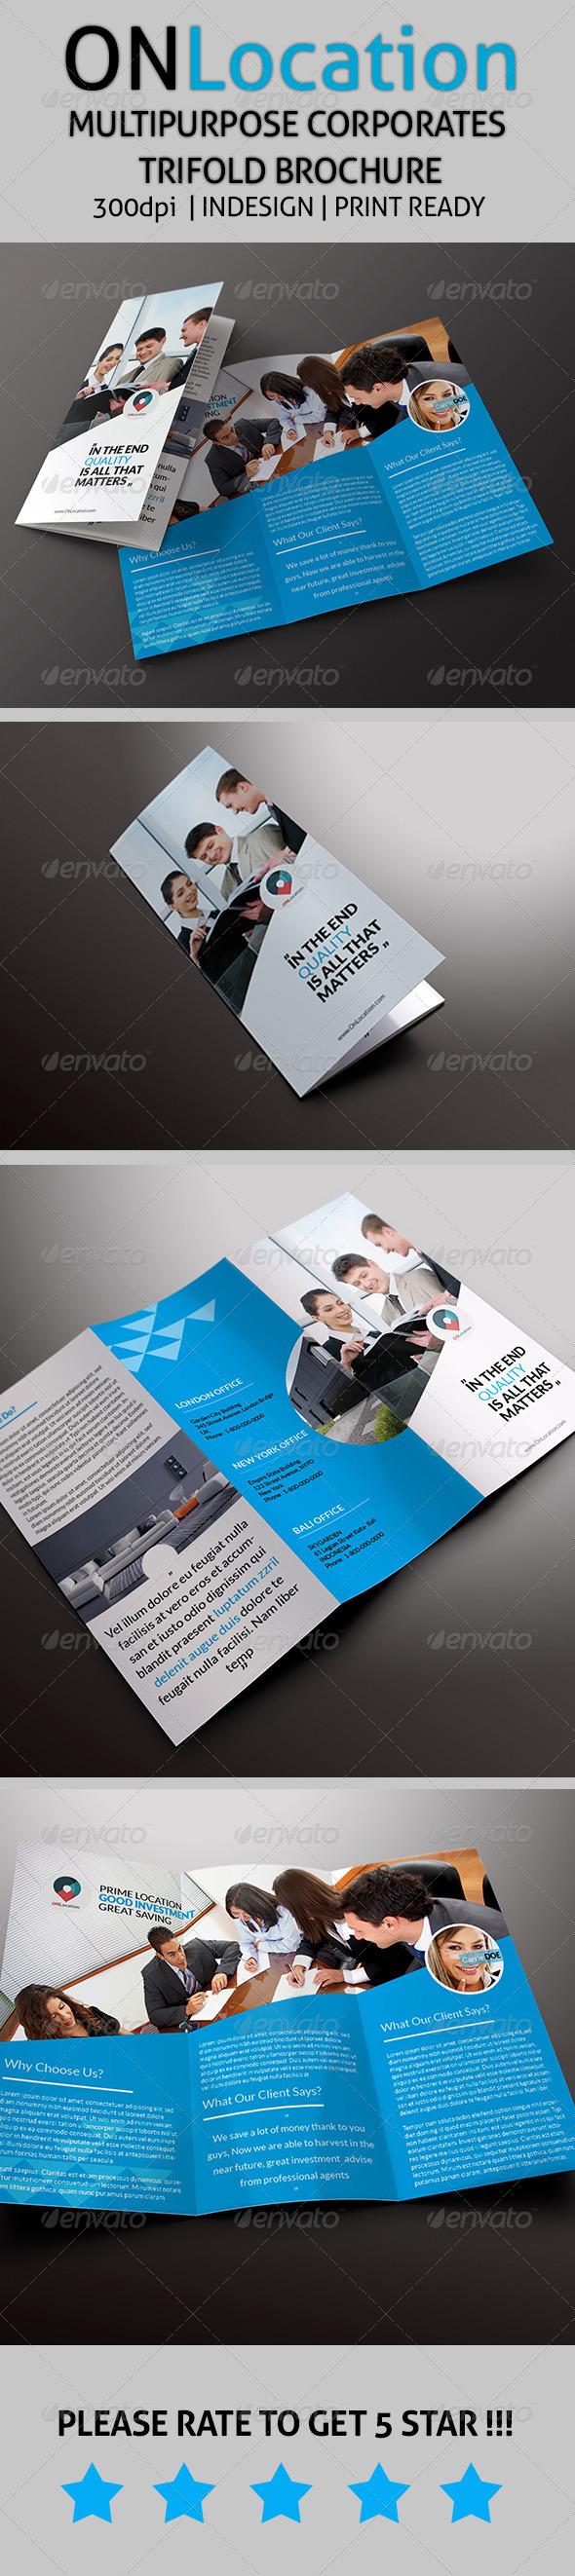 GraphicRiver OnLocation Corporate Trifold Brochure 7700996